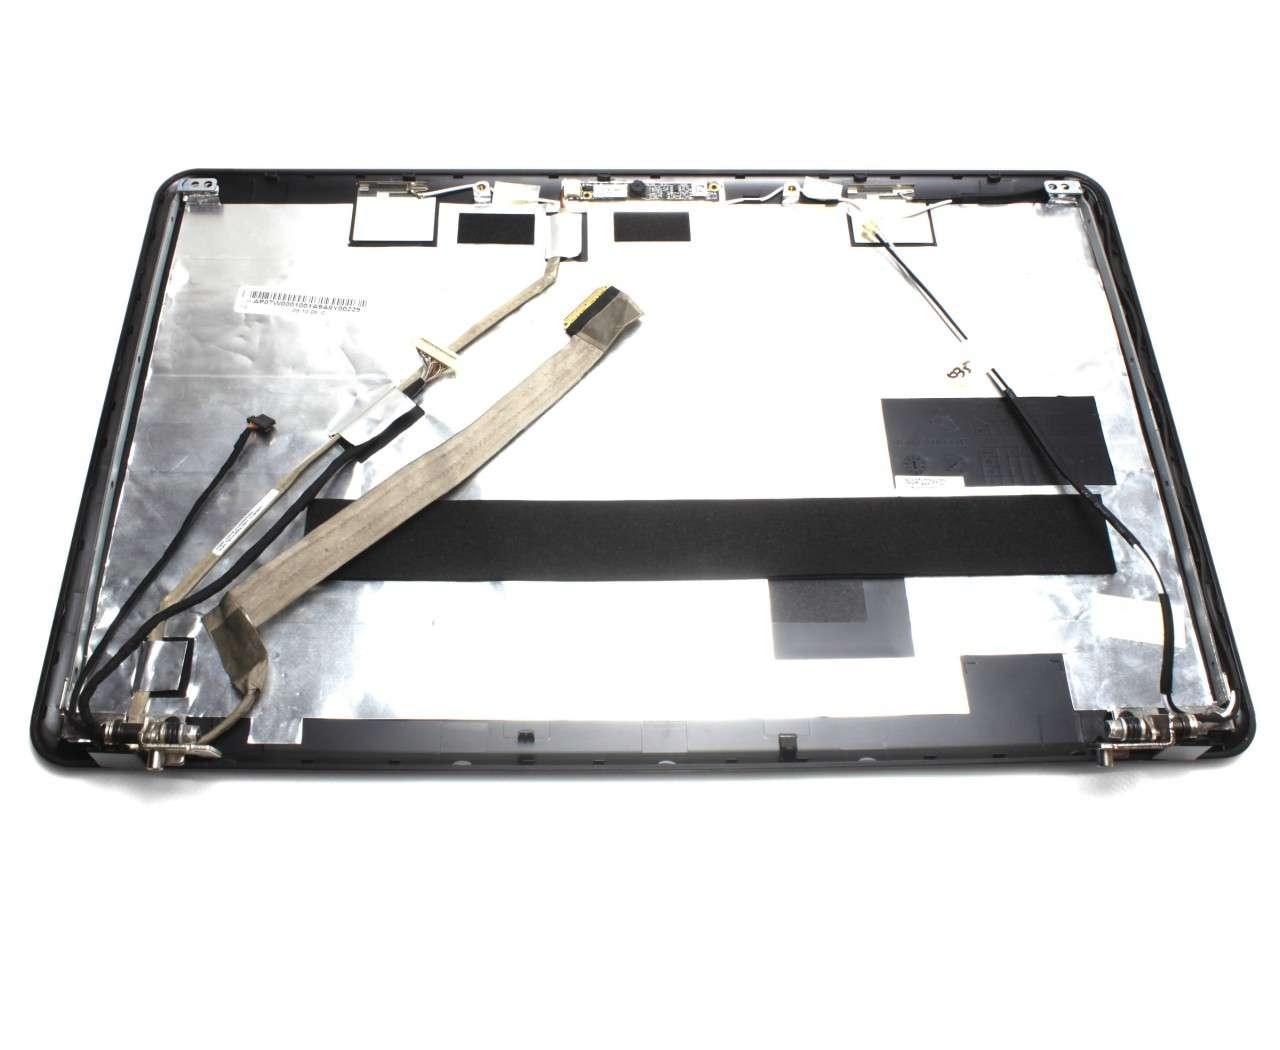 Capac Display BackCover Lenovo DC33000KK20 Carcasa Display imagine powerlaptop.ro 2021